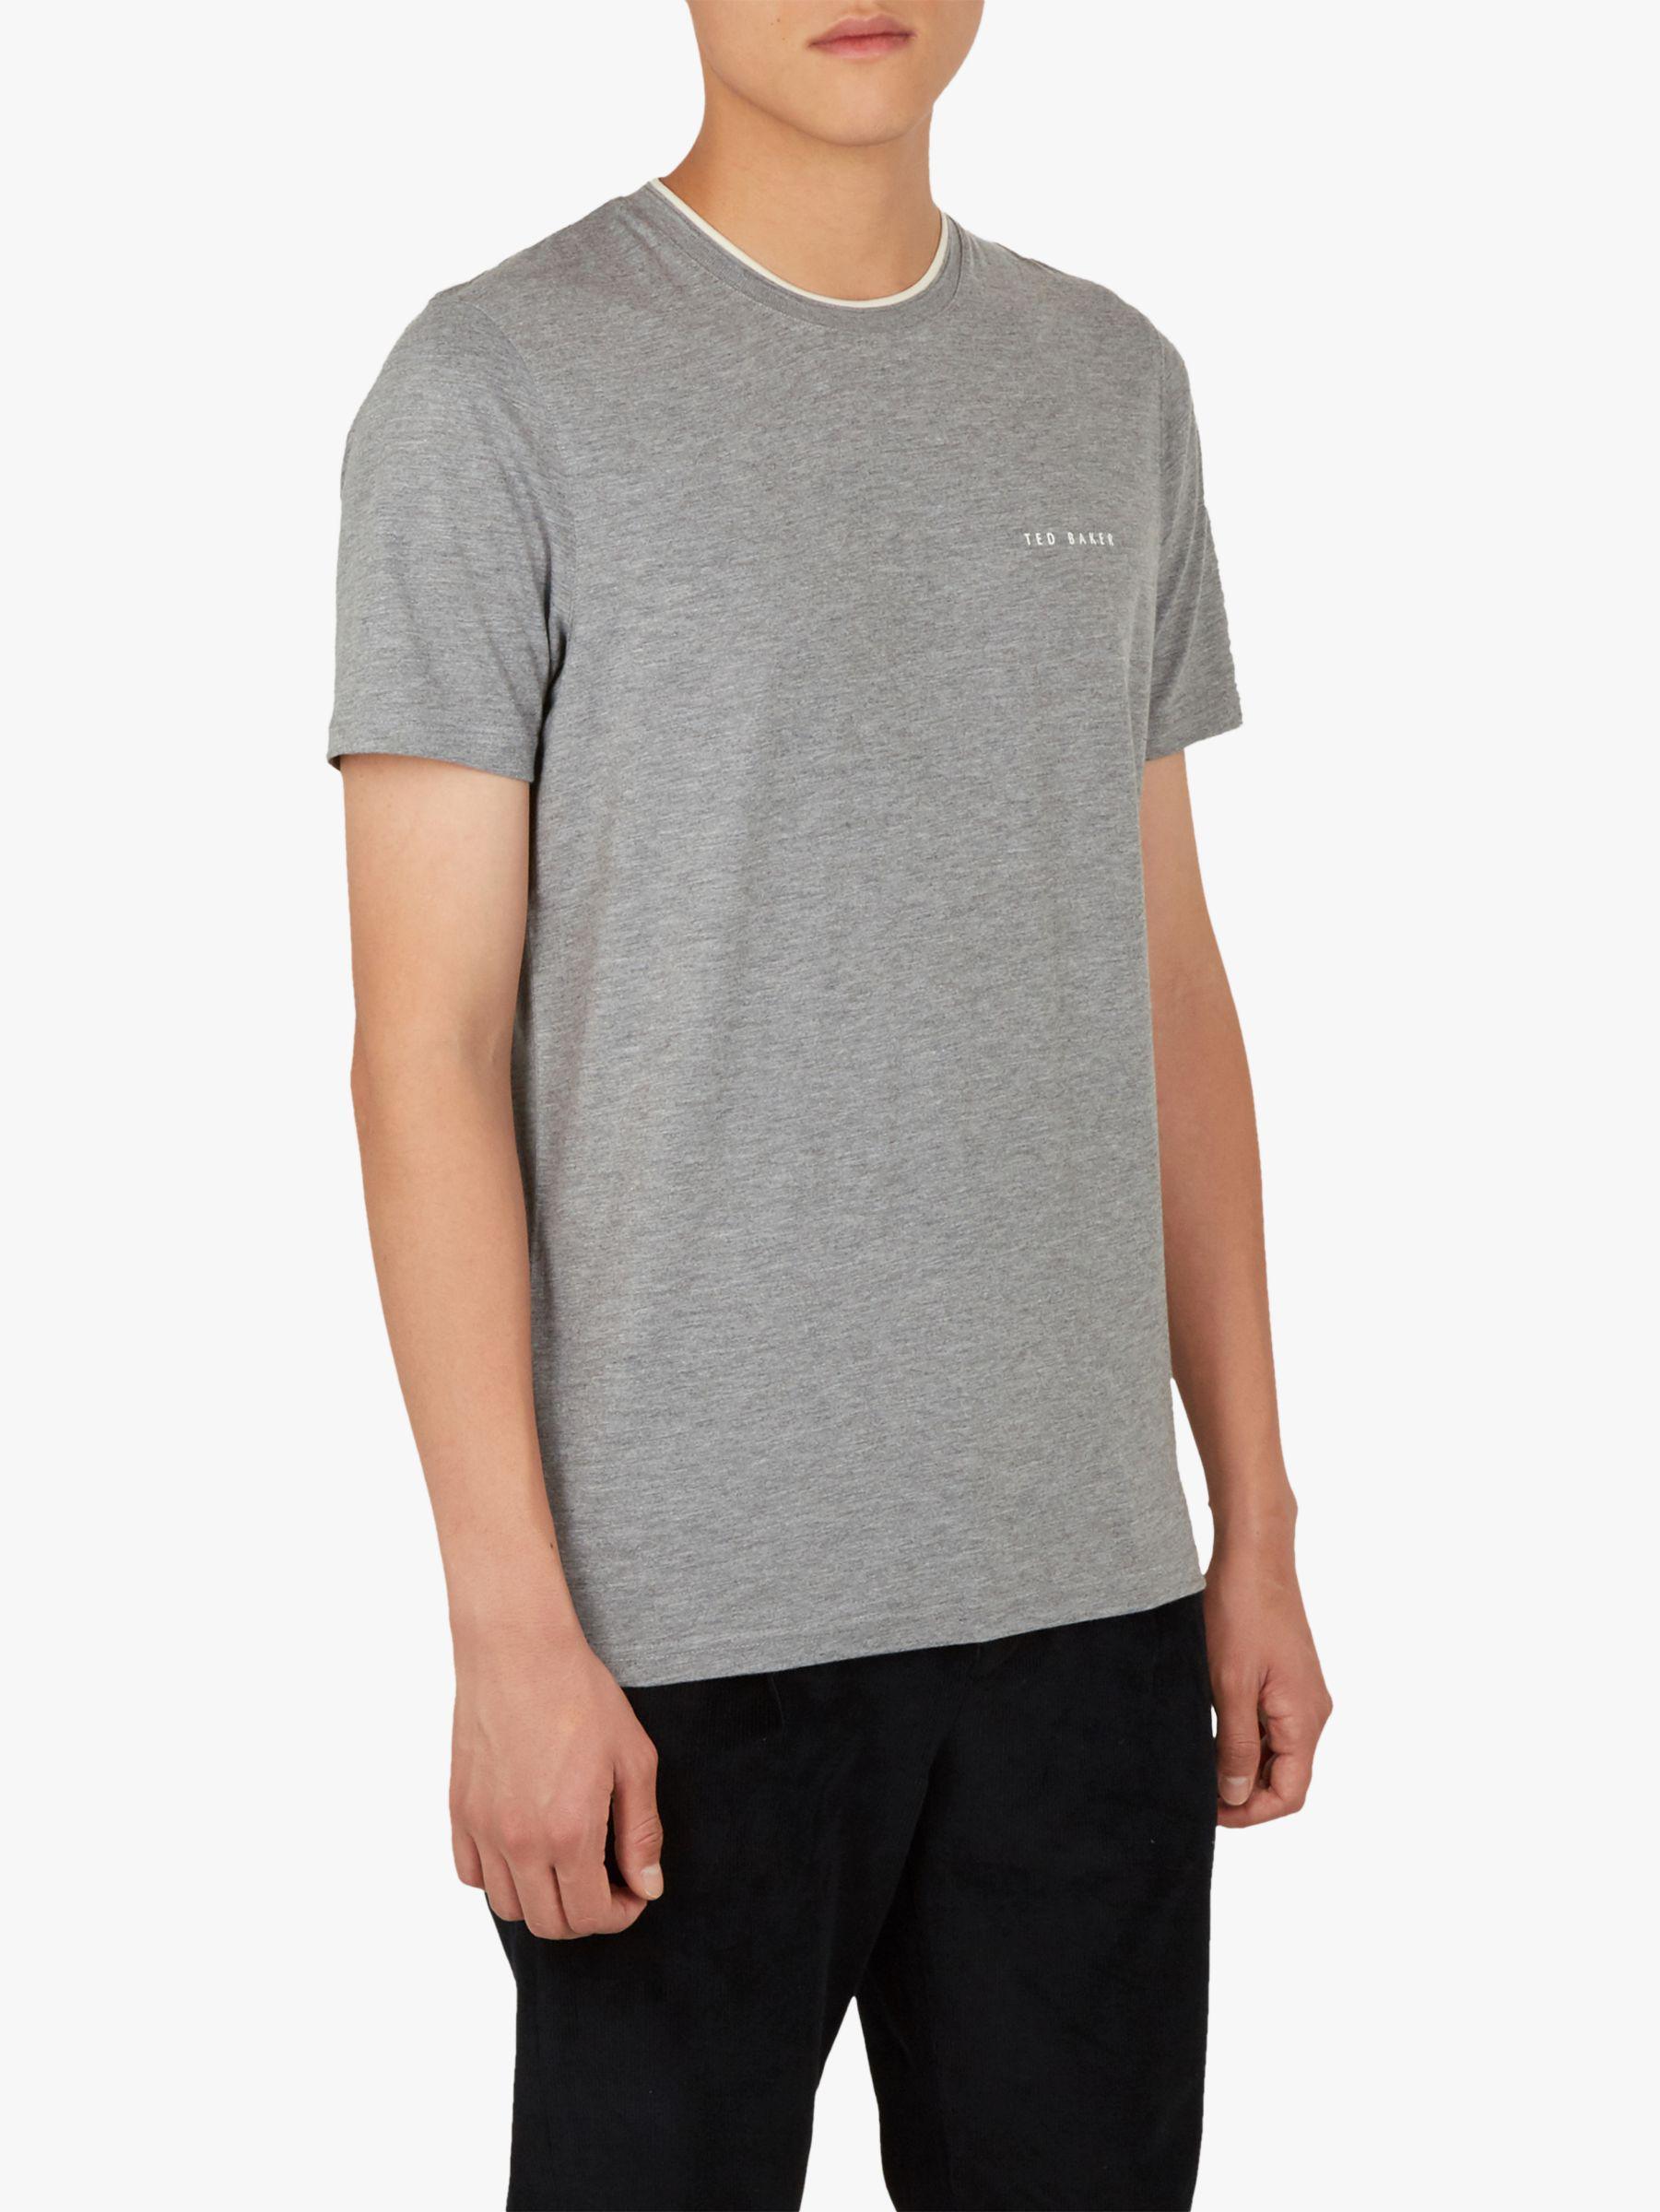 ac608bf66eeeb9 Ted Baker - Gray Rooma Short Sleeve T-shirt for Men - Lyst. View fullscreen